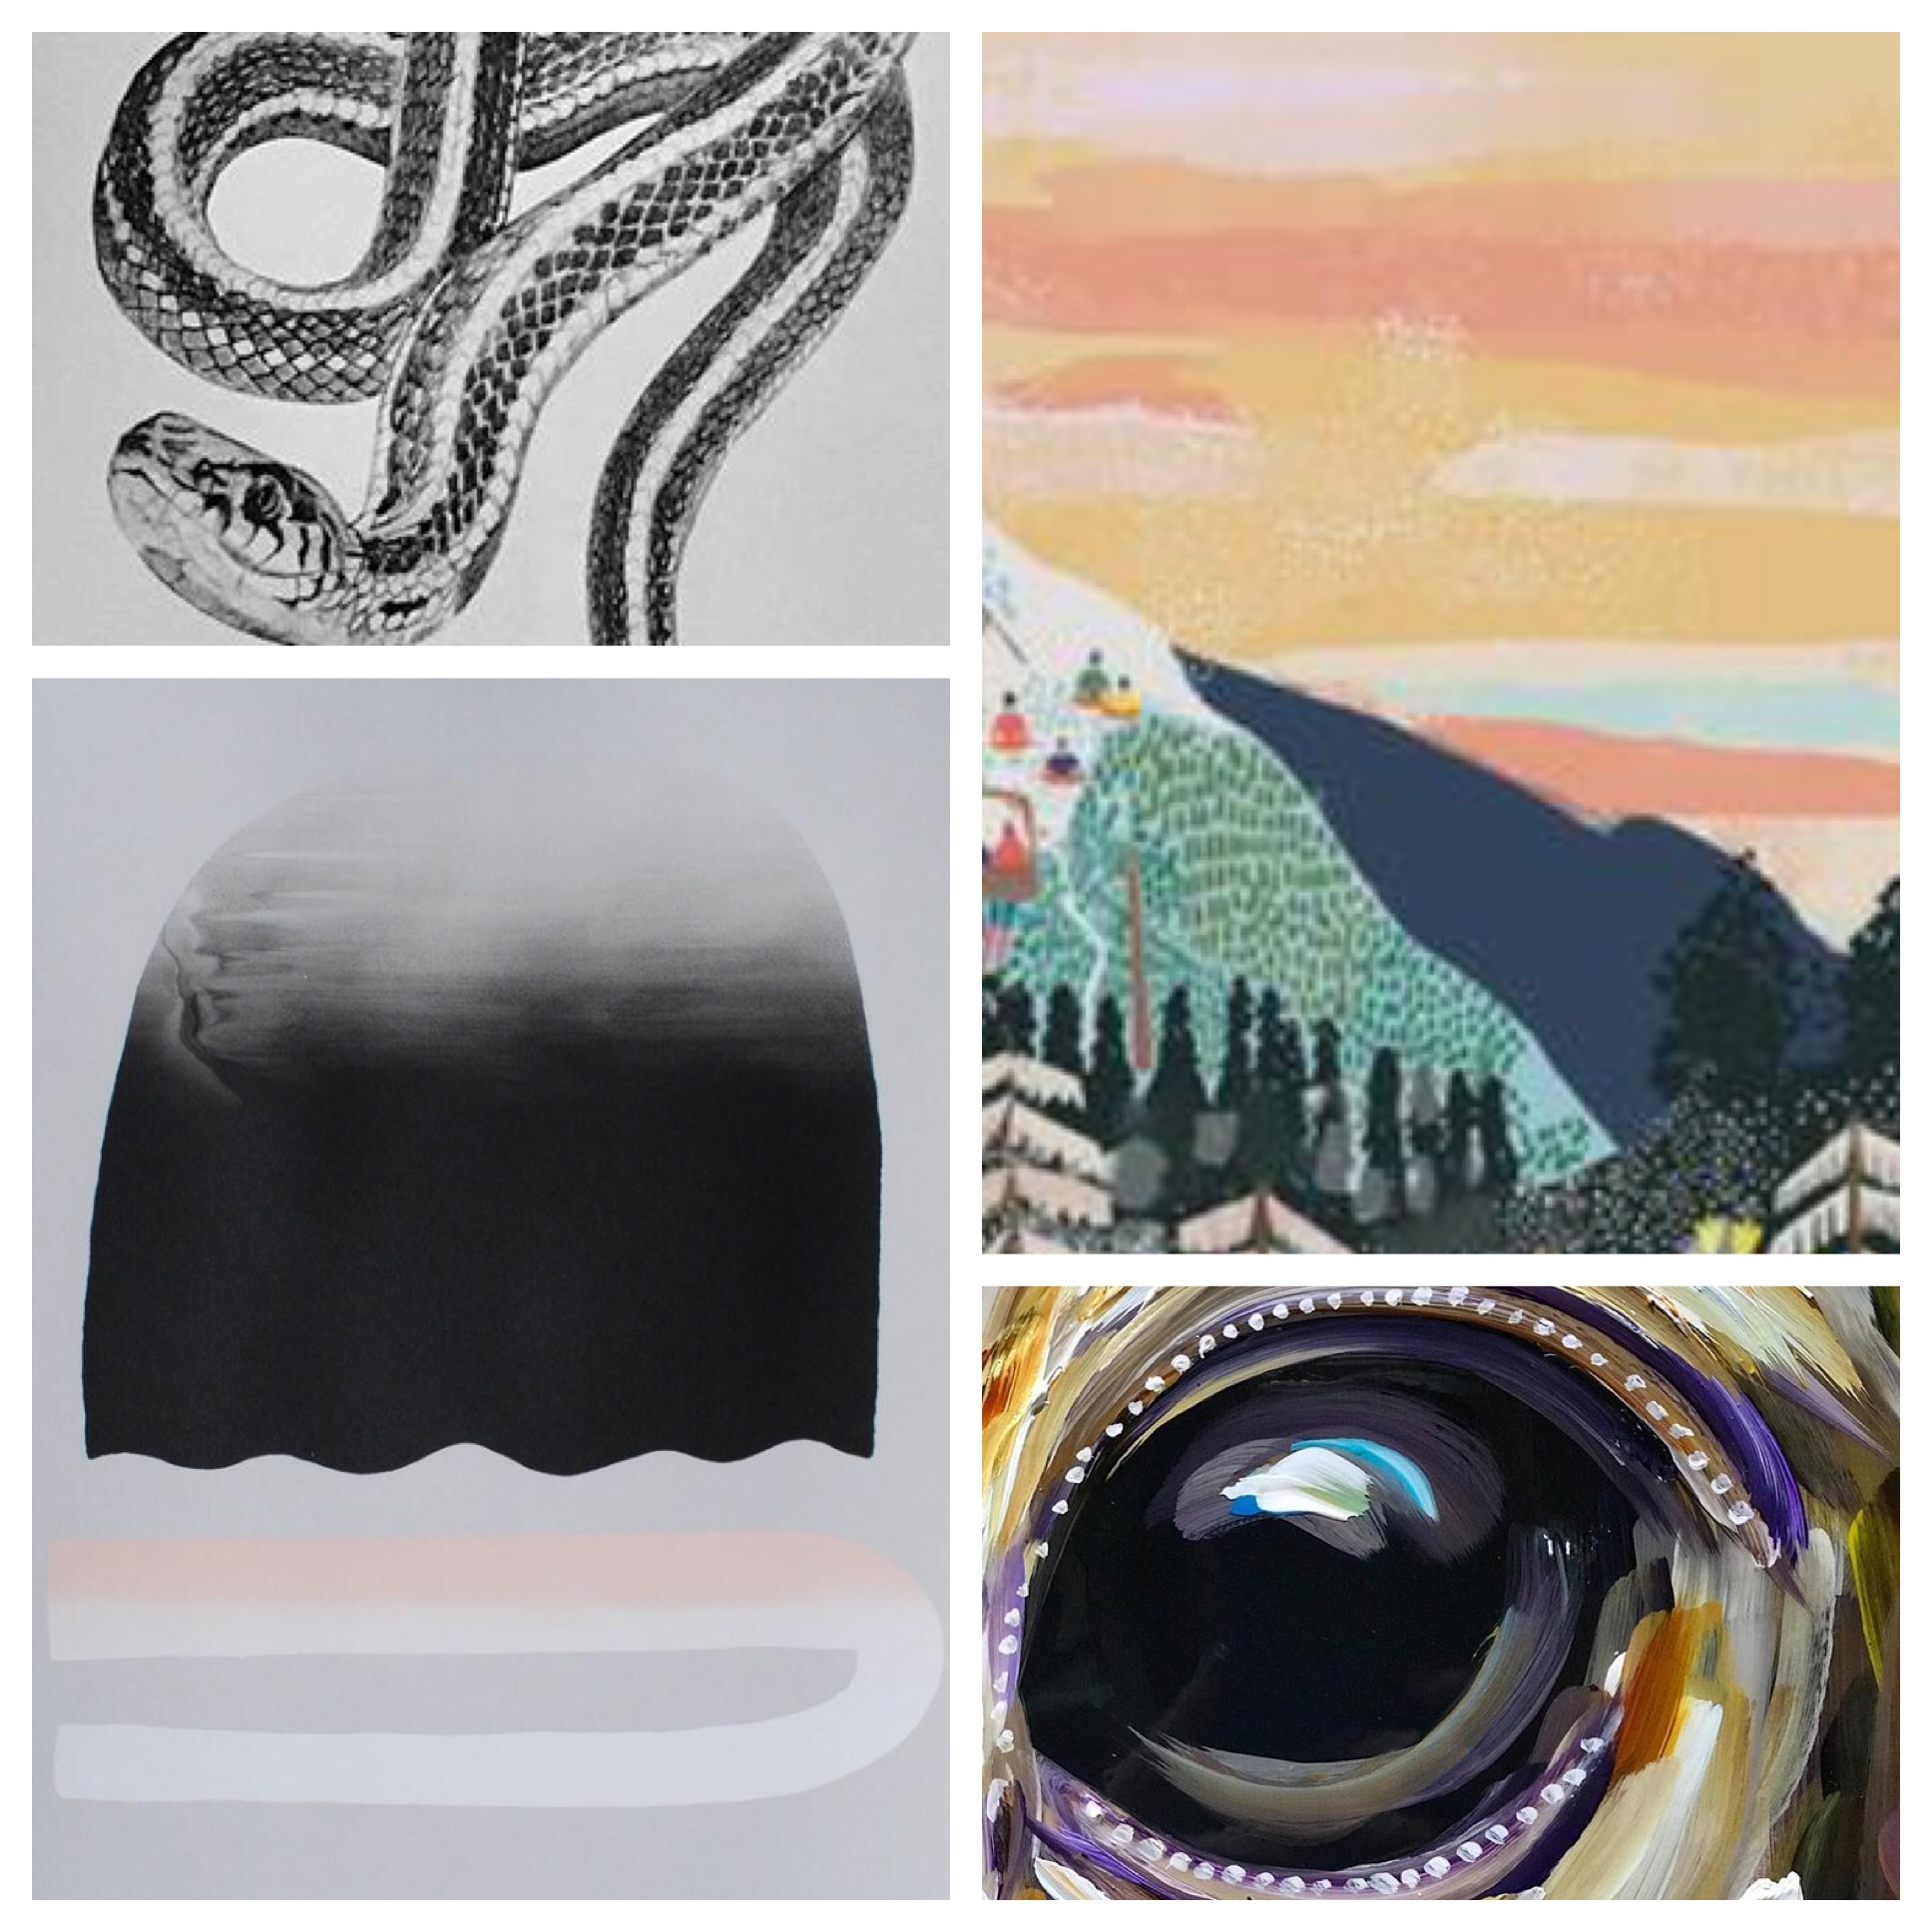 CLOCKWISE L TO R: SARAH HAMMOND STUDIO, ANJA JANE, KANDICE KEITH, ANNIE AXTELL